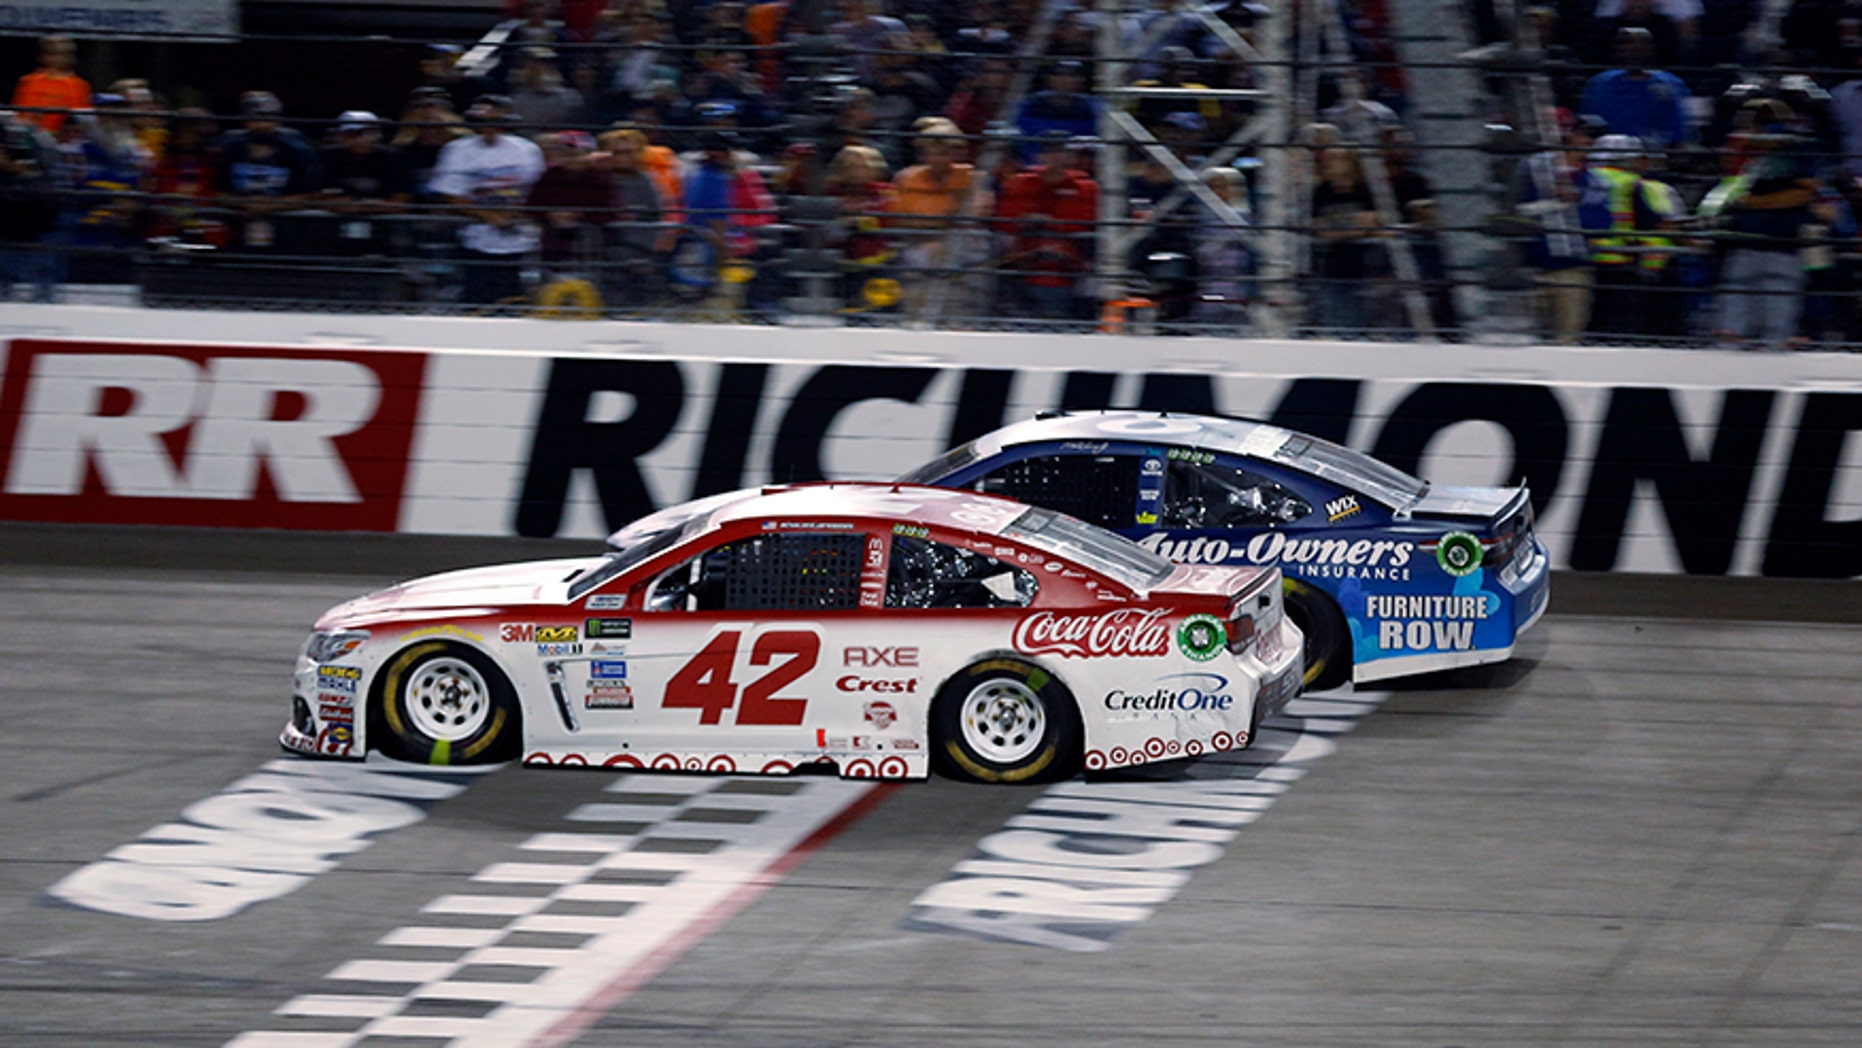 Kyle Larson (42) passes Martin Truex, Jr., (78) on the final restart to win the NASCAR Cup Series auto race at Richmond International Raceway in Richmond, Va., Saturday, Sept. 9, 2017. (AP Photo/Steve Helber)